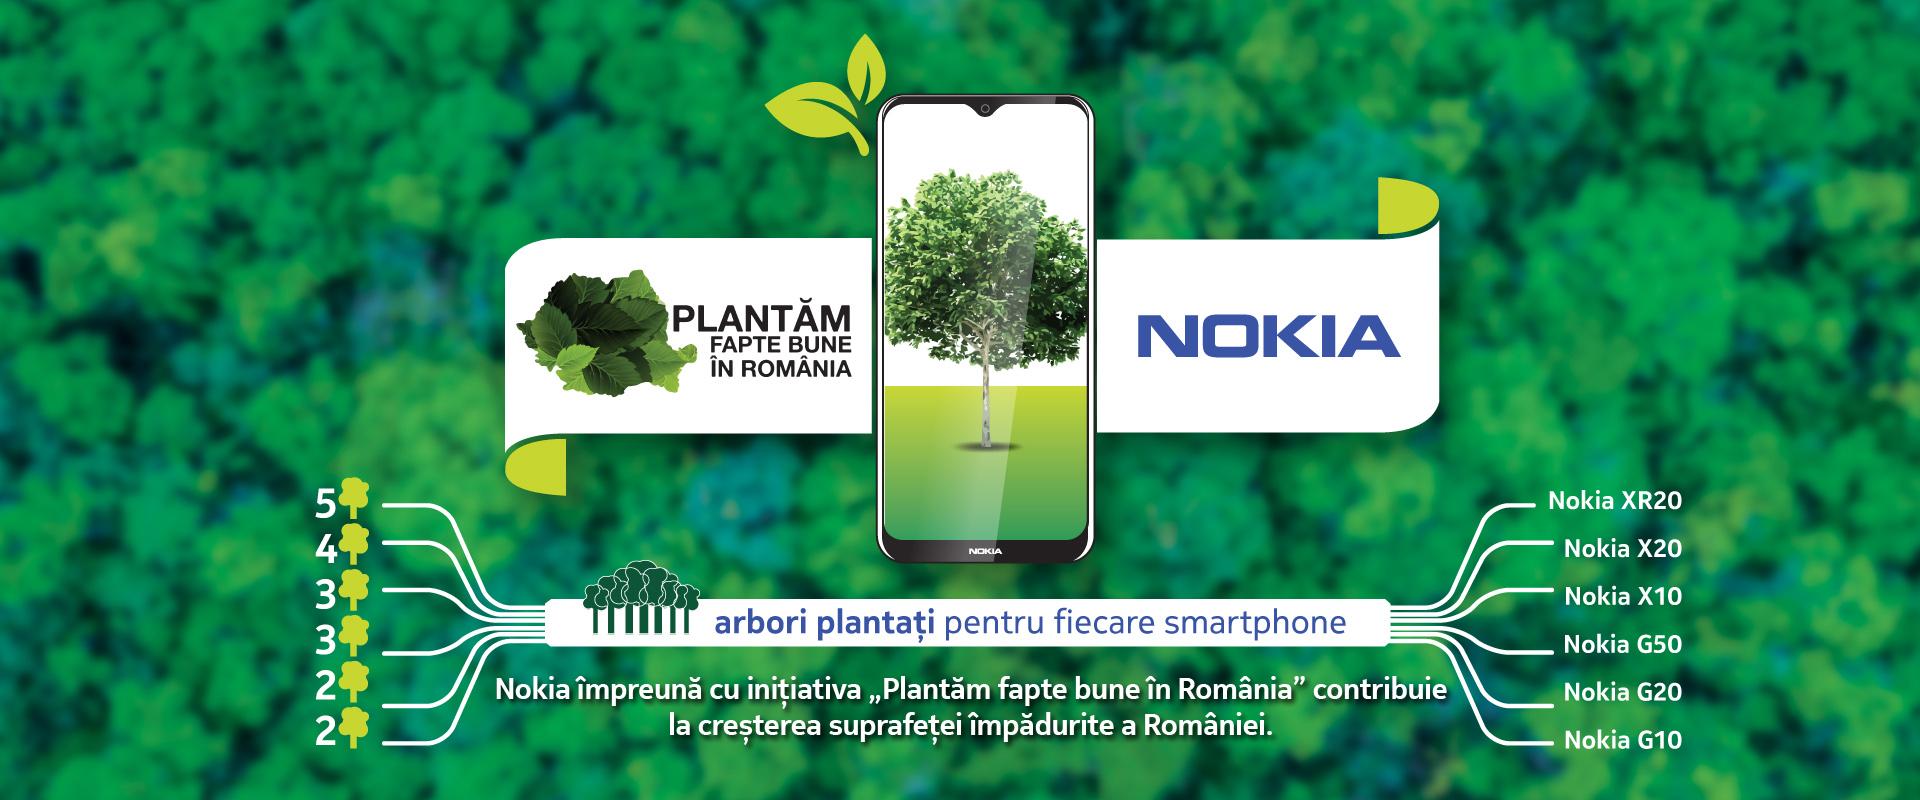 Nokia-copaci